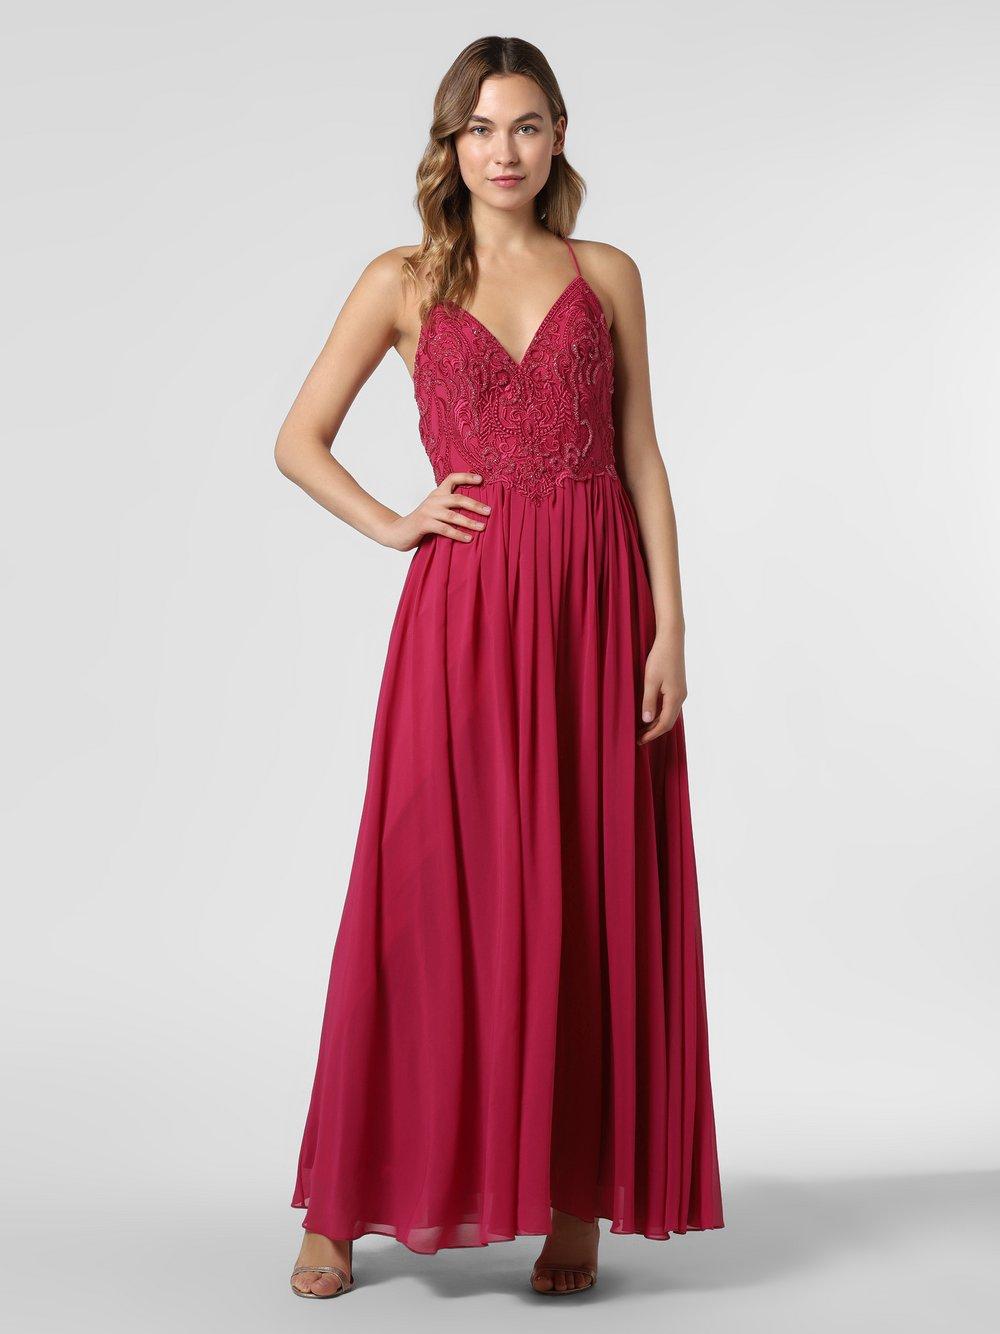 Laona – Damska sukienka wieczorowa, różowy Van Graaf 466889-0001-00380